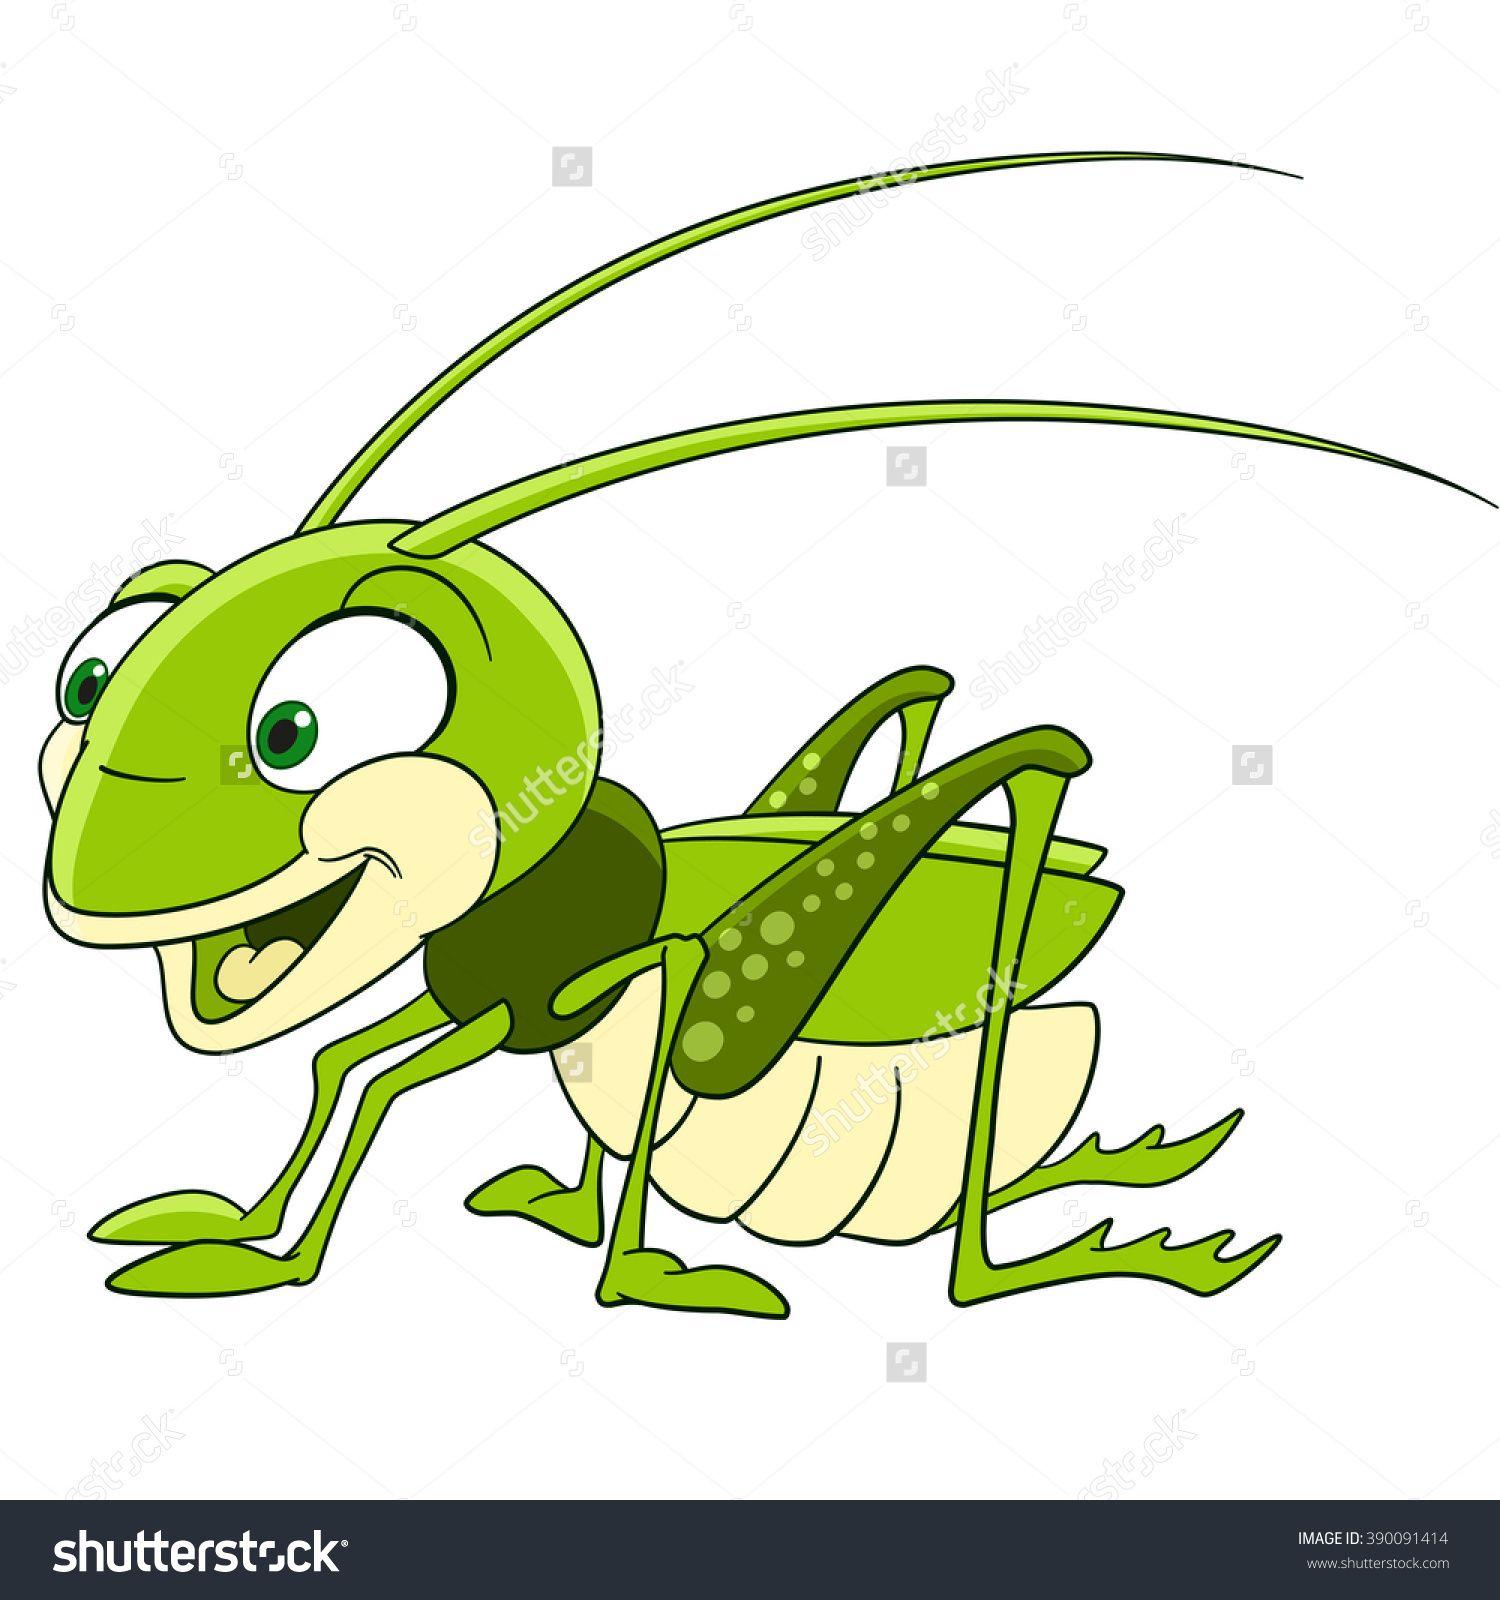 Cute And Funny Smiling Cartoon Grasshopper (Locust, Katydid.